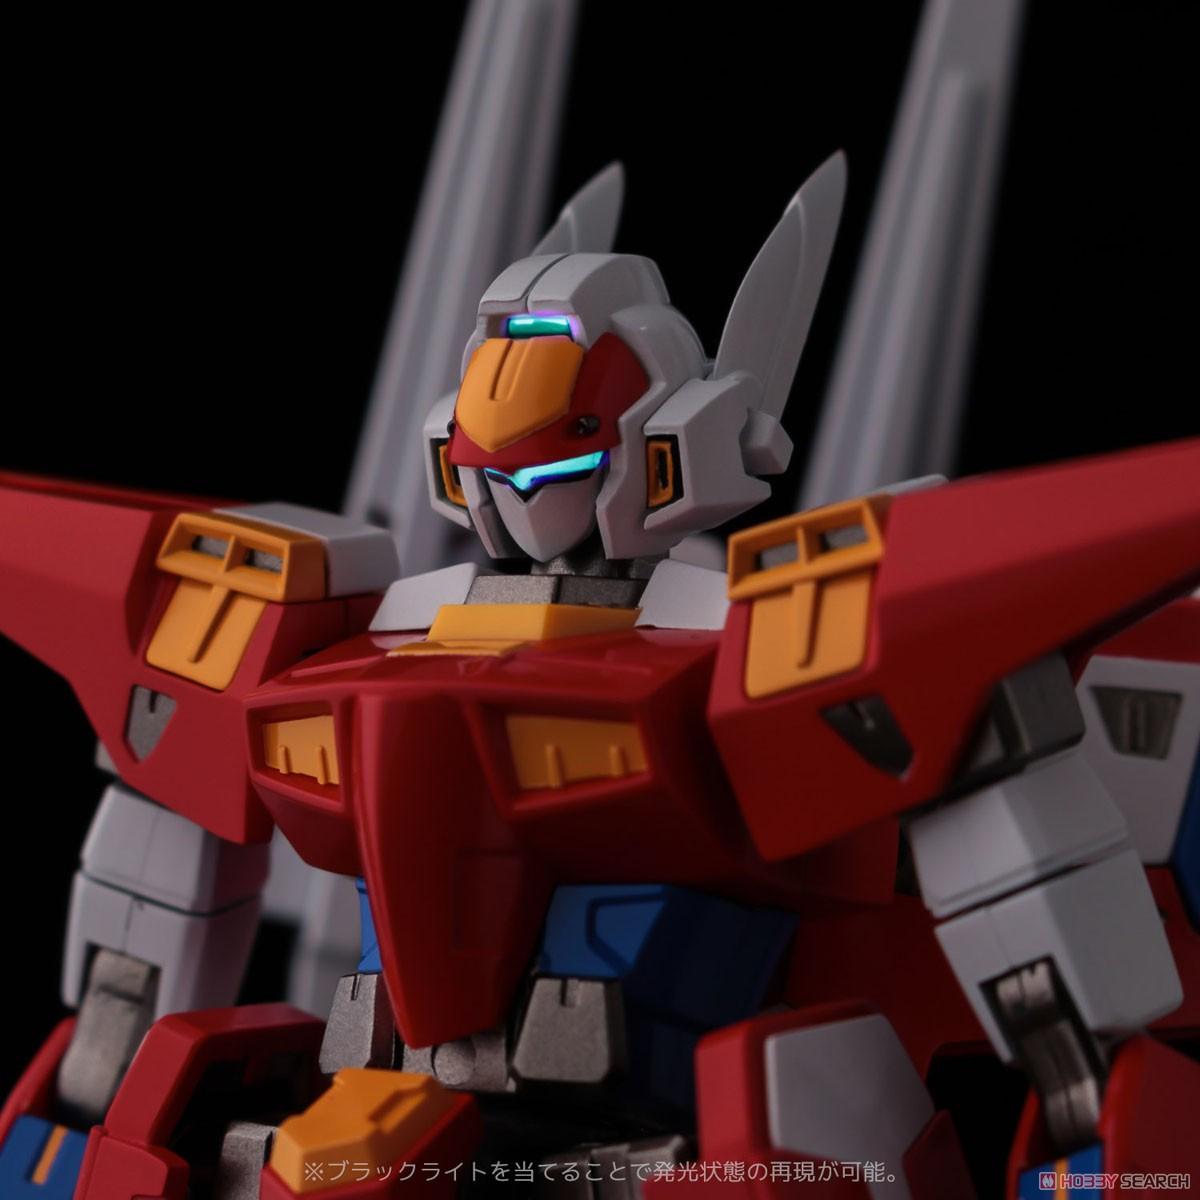 RIOBOT『変形合体 R-1』スーパーロボット大戦OG 可変合体フィギュア-036